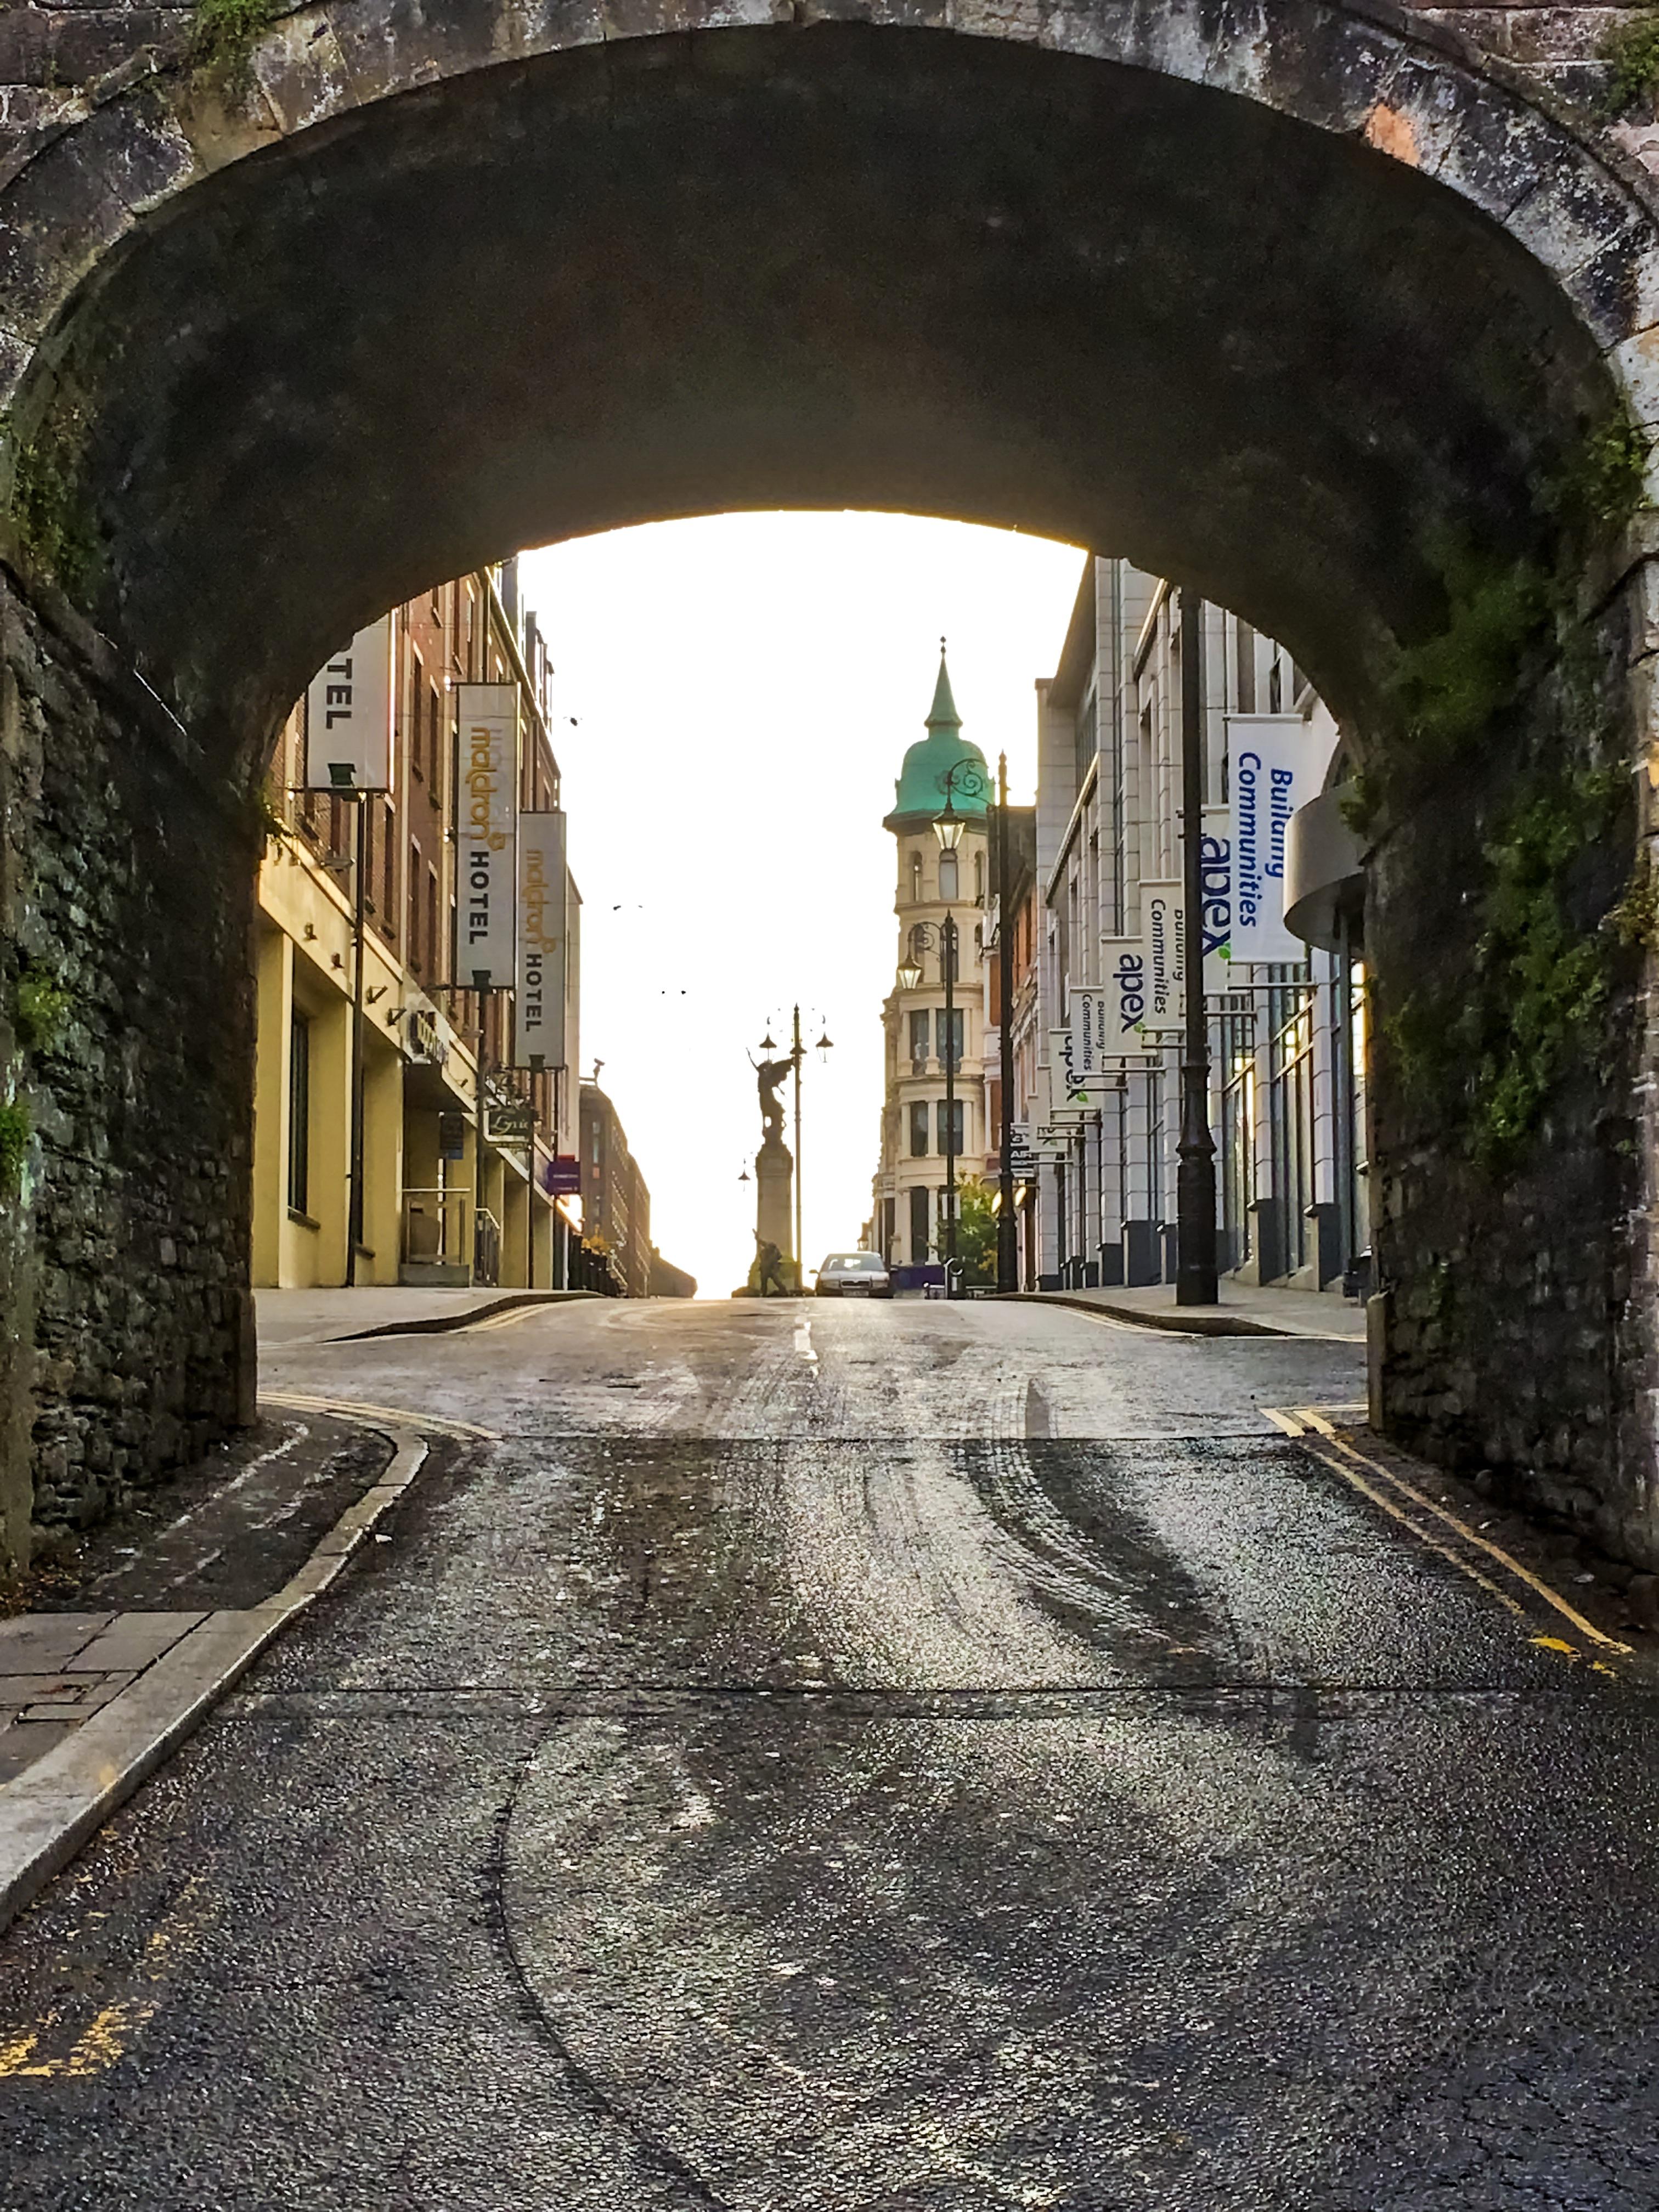 derry walls, viaduct, derry, londonderry, northern ireland